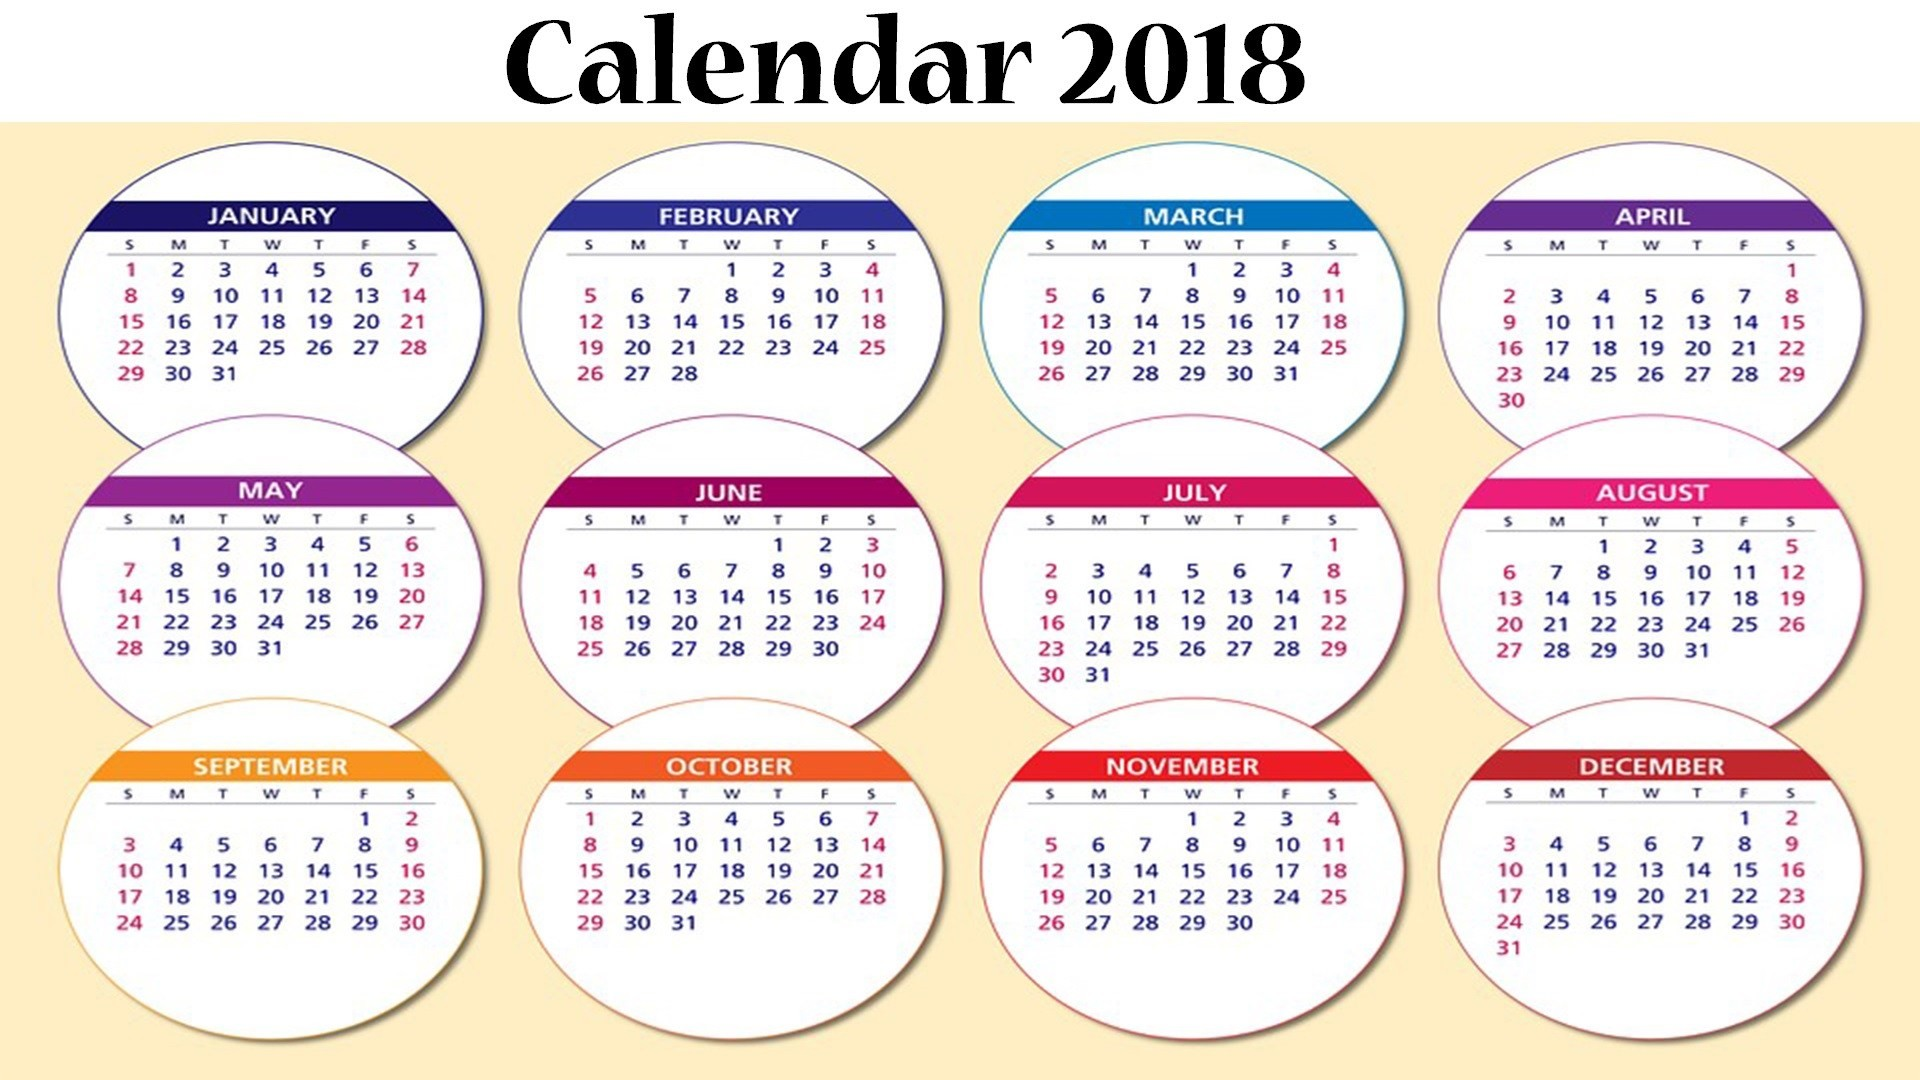 Tablet Calendar Wallpaper : Wallpapers with calendar  images